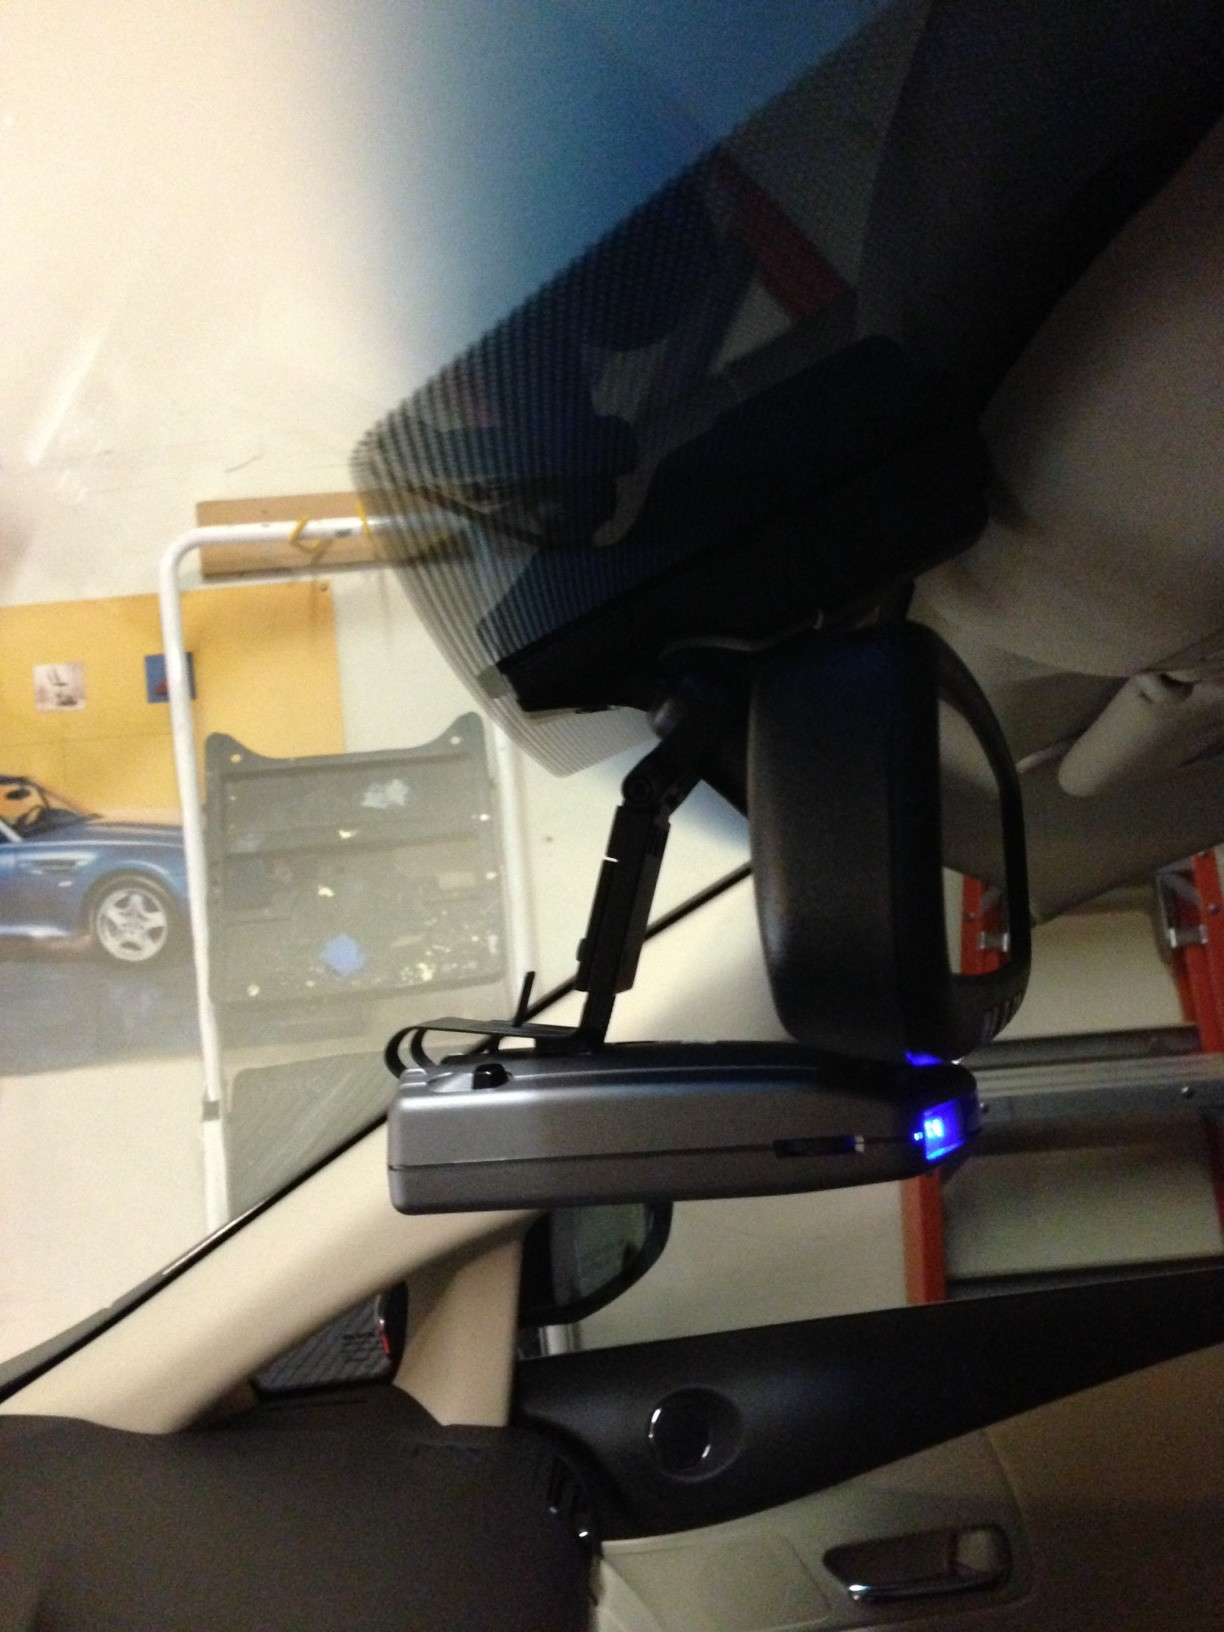 2013 Lexus Rx350 Radar Detector Mirror Mount Complete